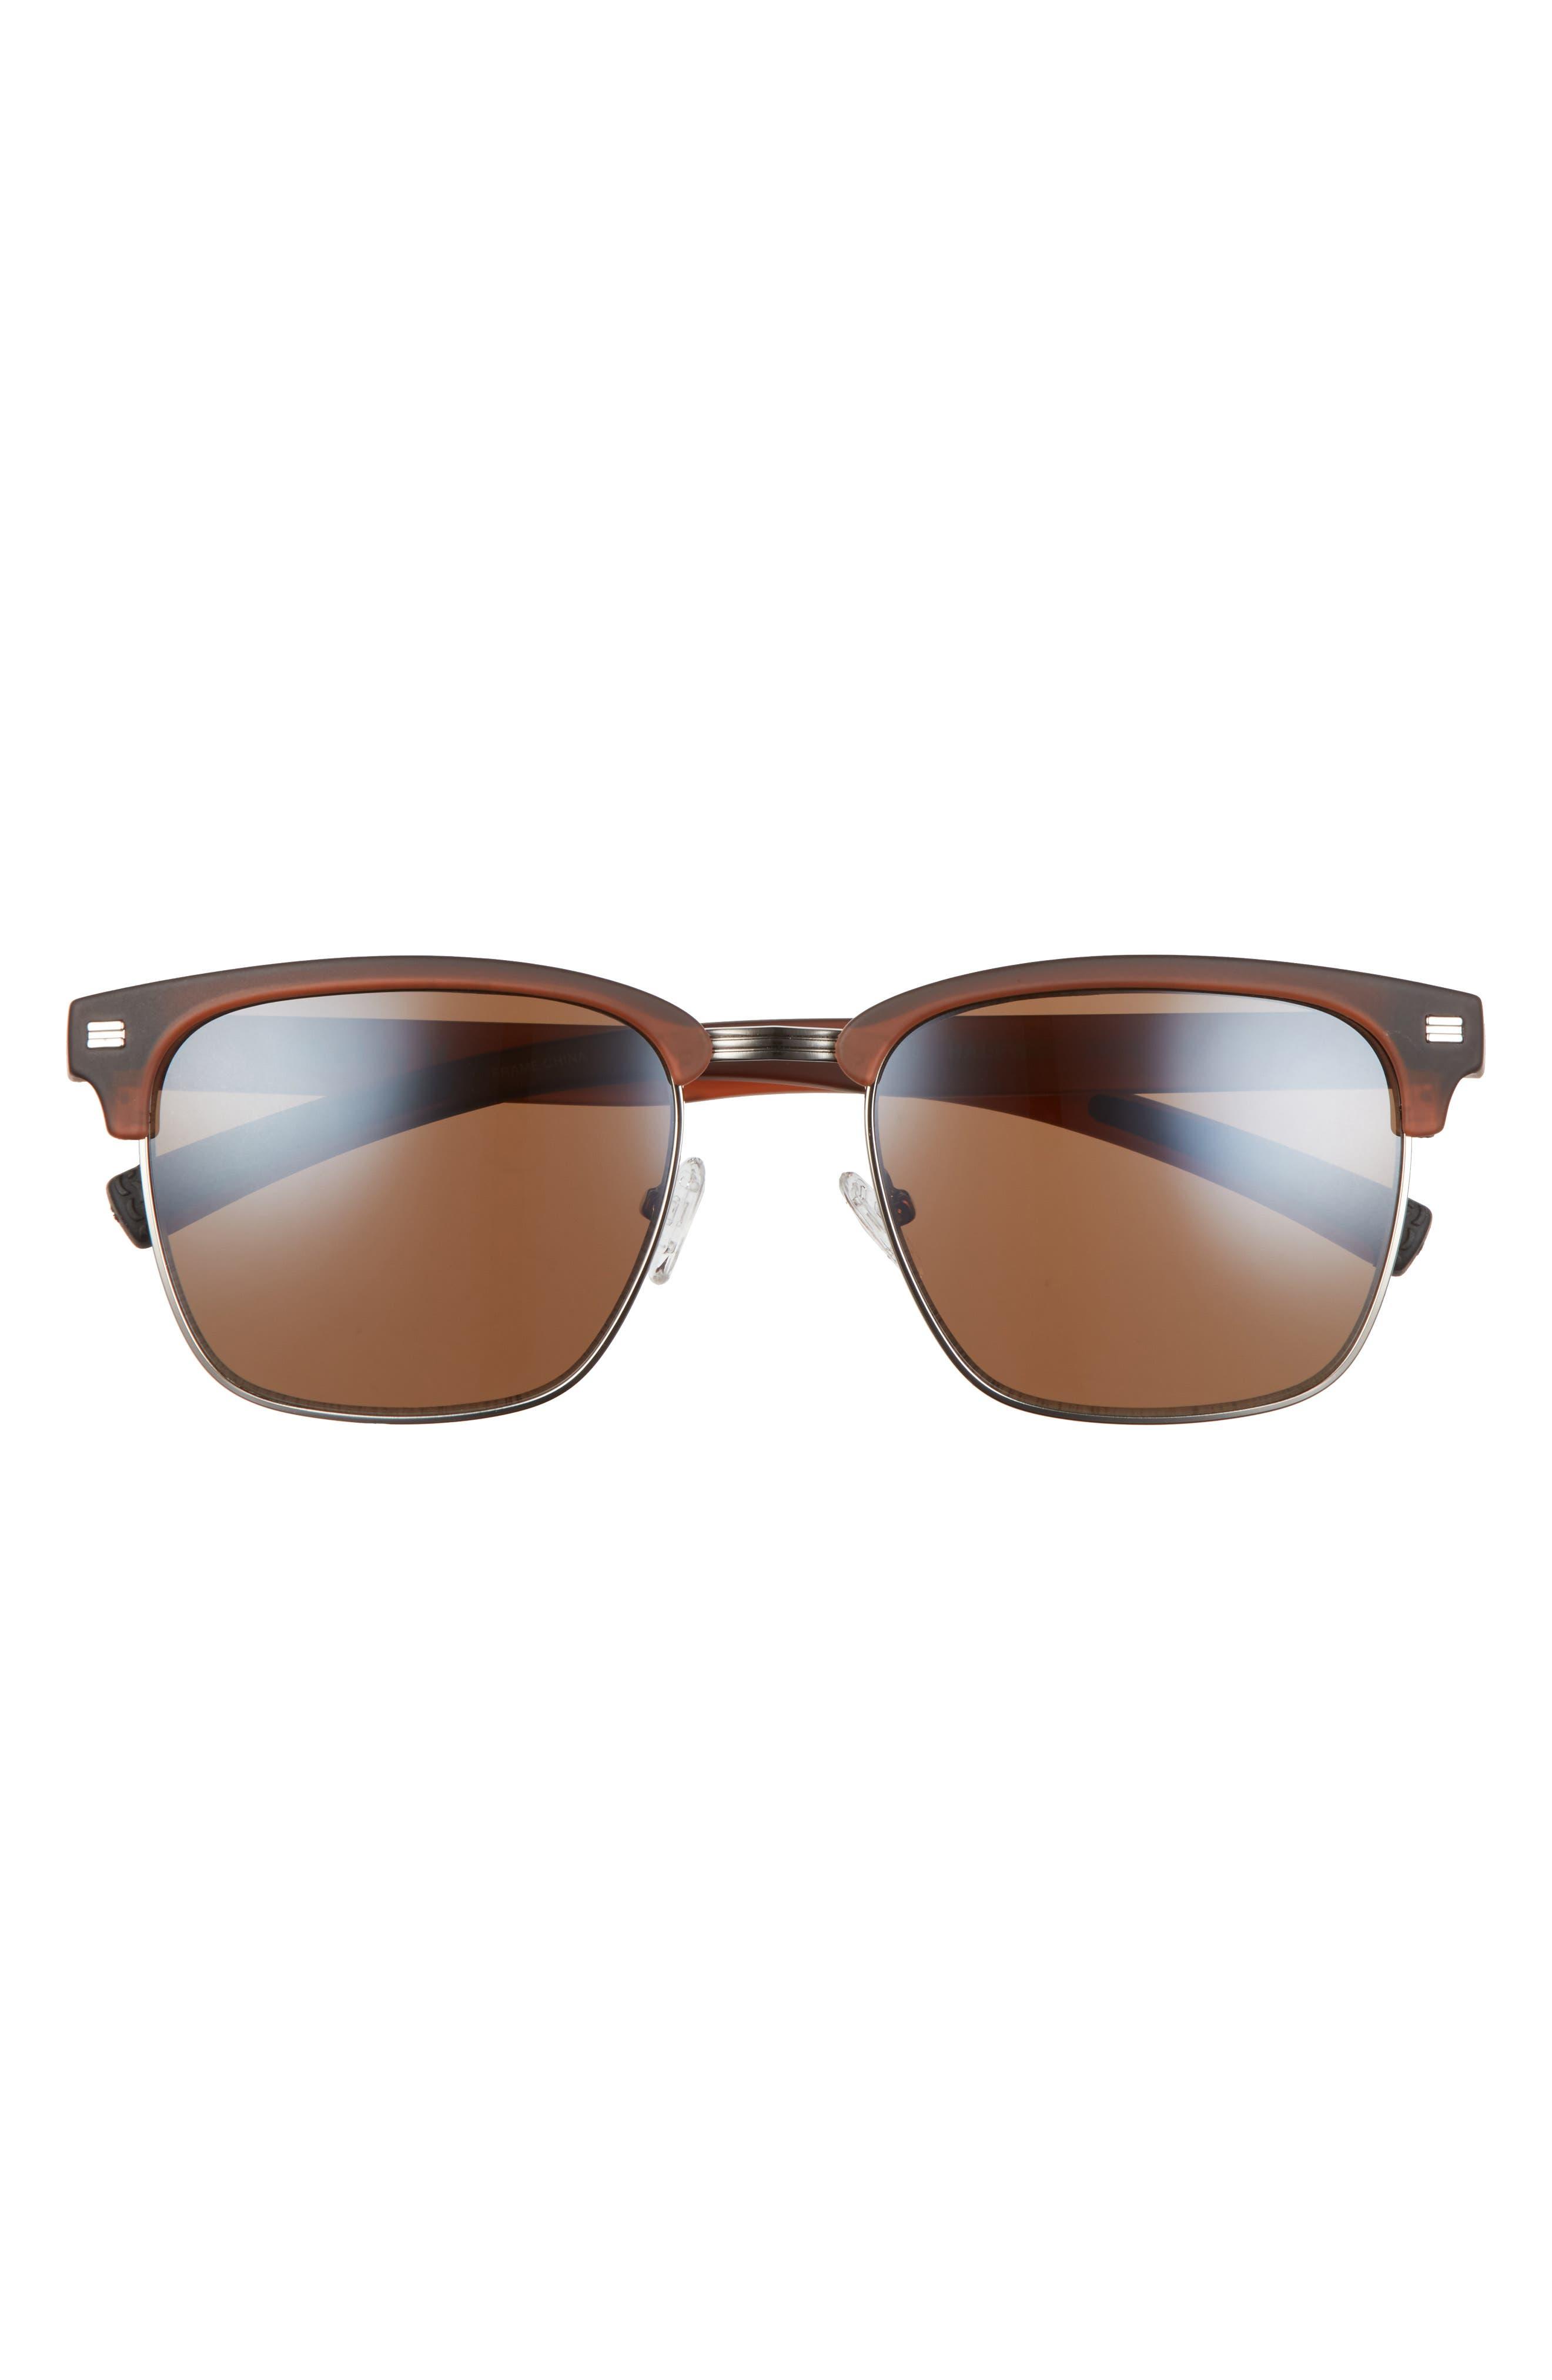 Halfway 56mm Polarized Browline Sunglasses